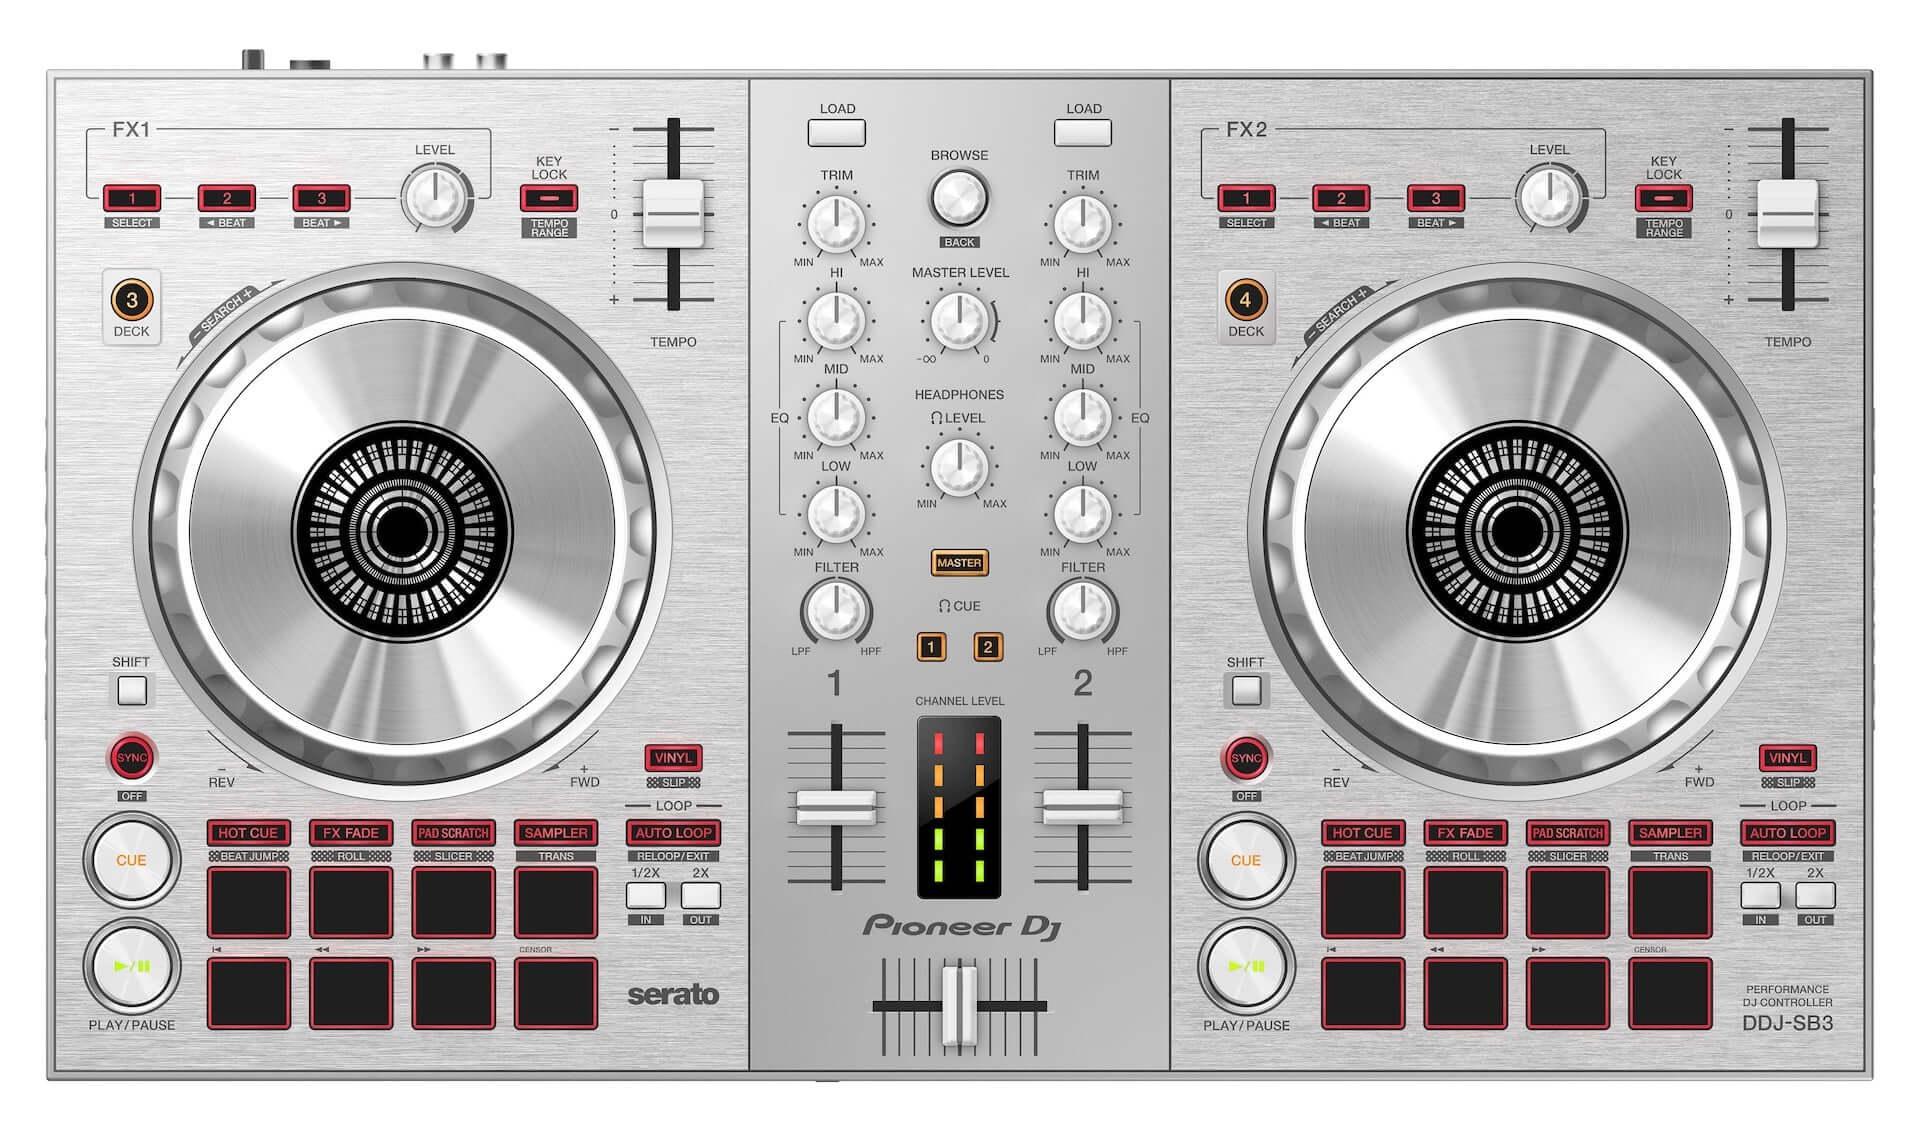 DJ初心者にもおすすめ!Serato DJ Lite対応DJコントローラー『DDJ-SB3』に限定ピュアシルバーカラーが登場 tech200714_ddjsb3_1-1920x1137